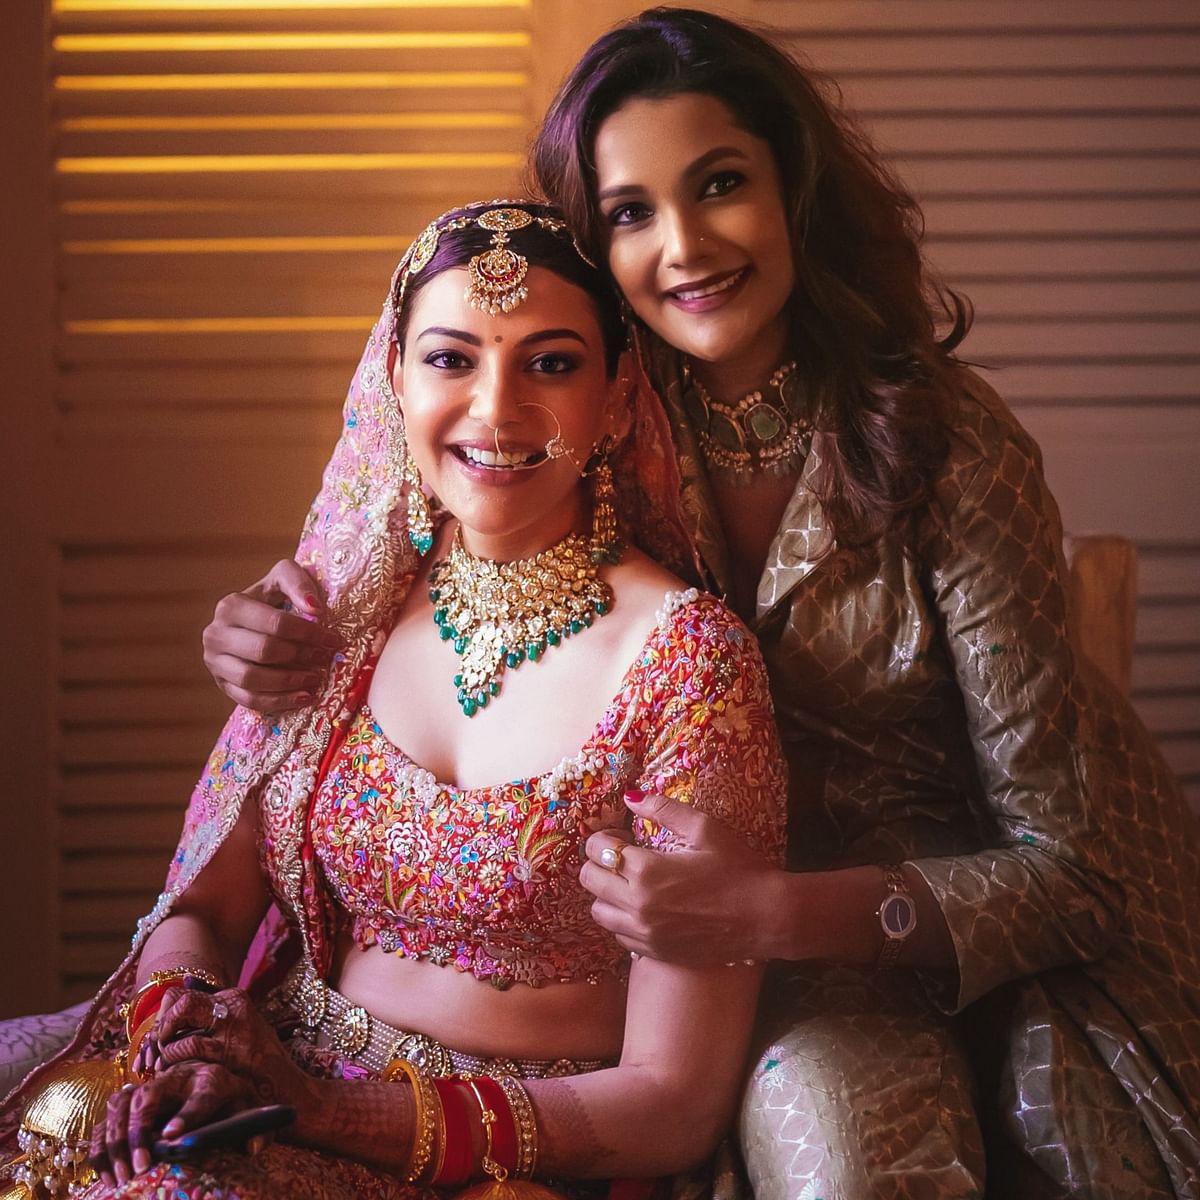 Meet Ambika Gupta – Kajal Aggarwal's luxe wedding planner who designed the 'Kashmir to Kanyakumari' theme for her big day